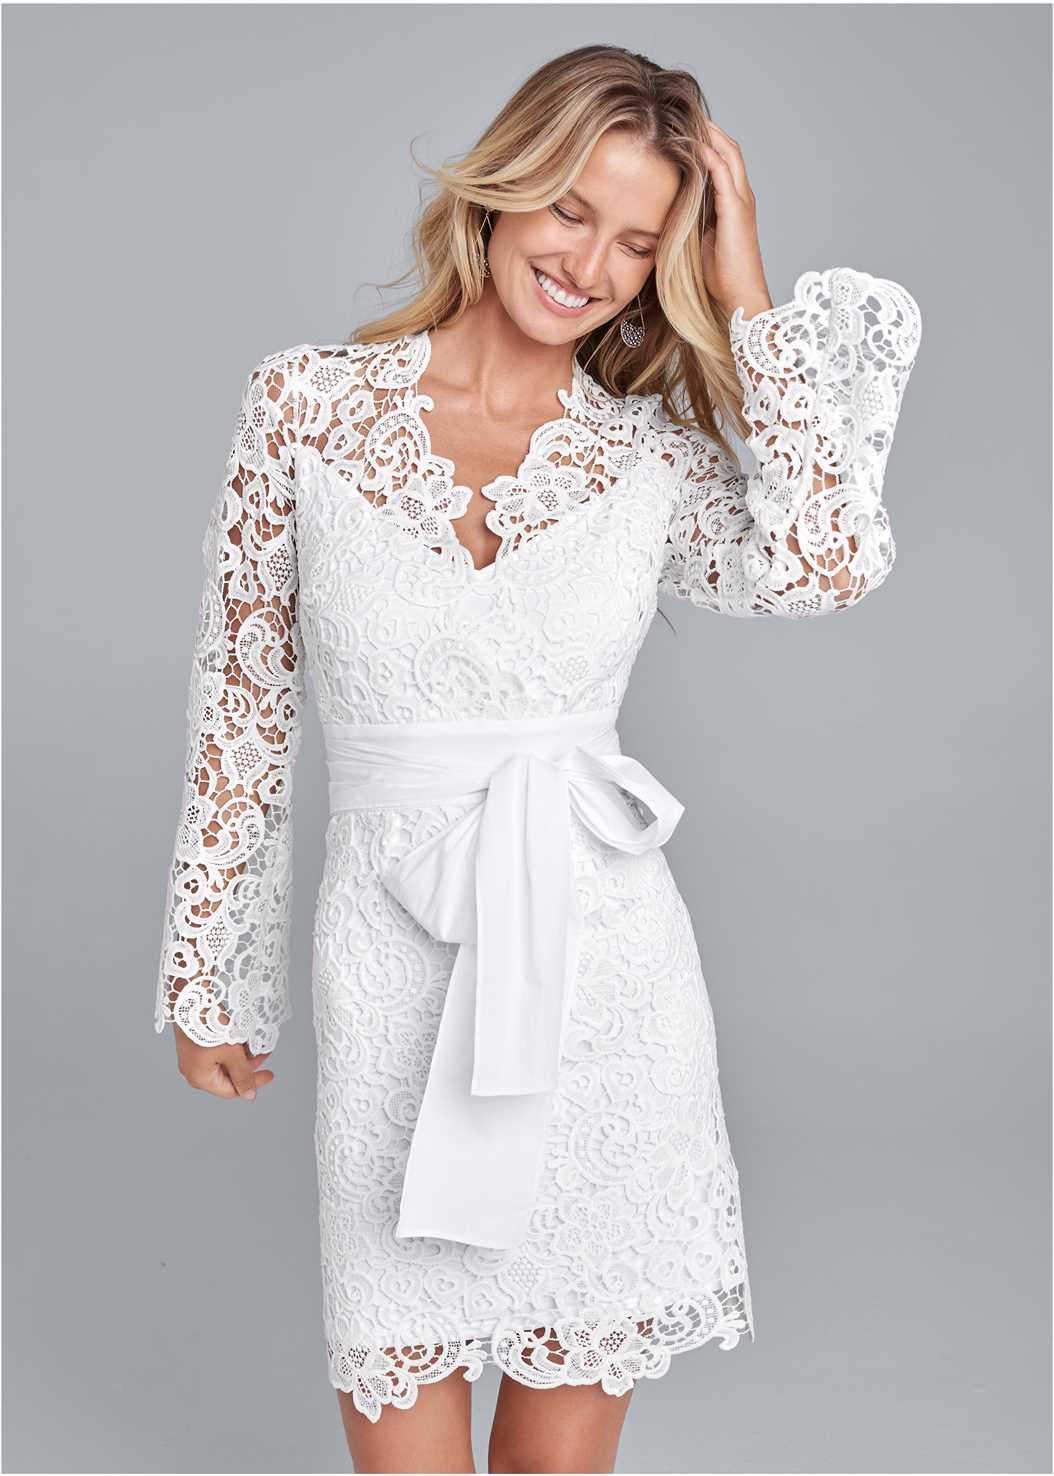 Lace Bell Sleeve Mini Dress,Pearl™ By Venus Perfect Coverage Bra,Square Toe Thong Heel Sandal